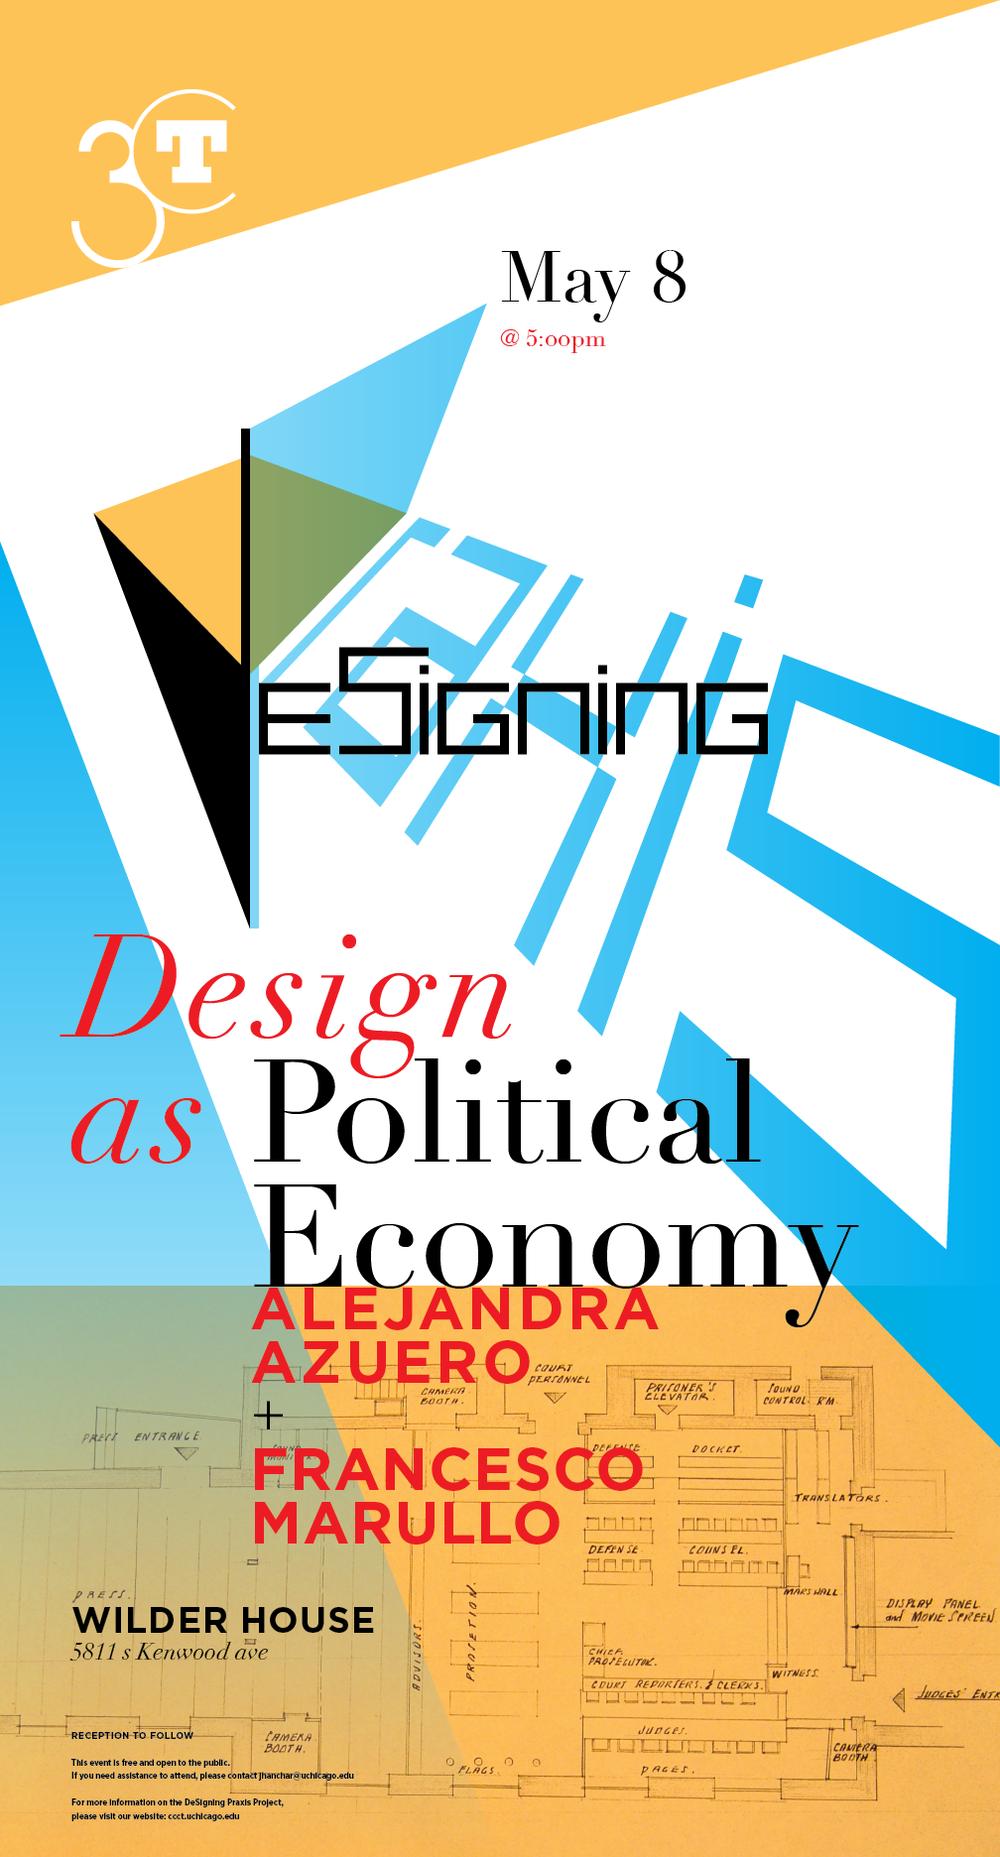 Poster for Design as Political Economy dialogue event with Alejandra Azuero and Francesco Marullo